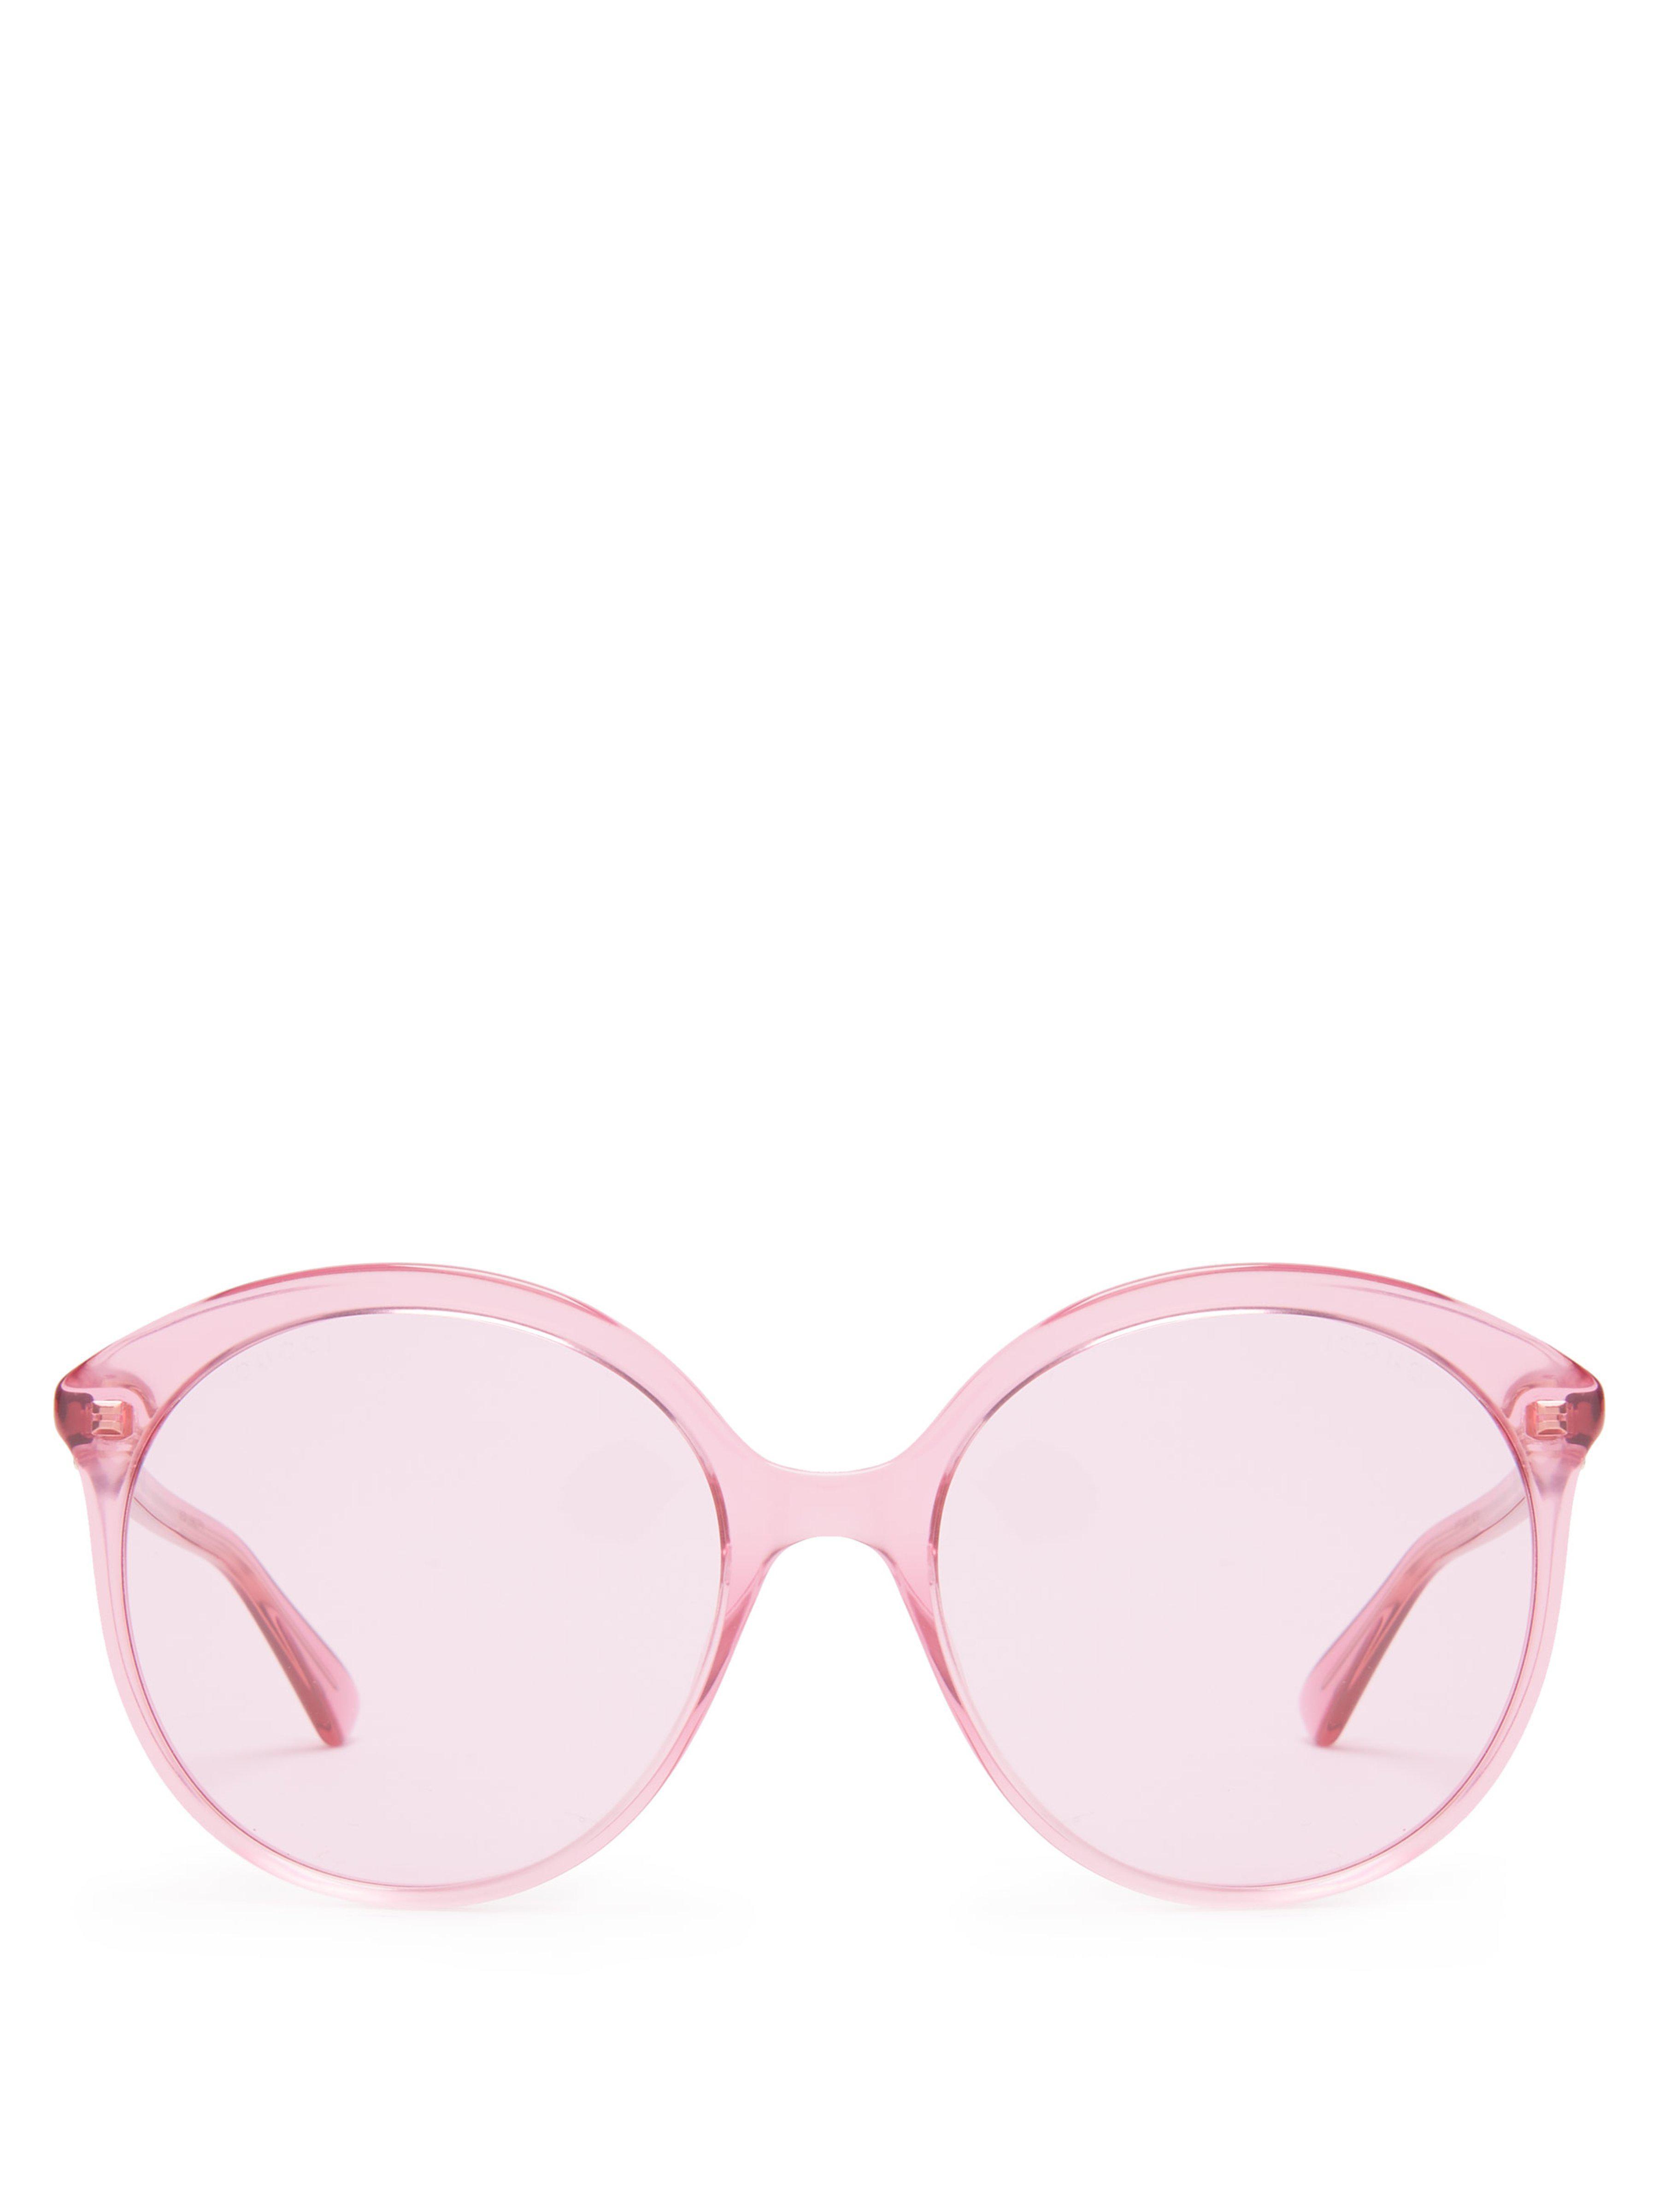 9887e8cefa8 Gucci Round Cat Eye Frame Acetate Sunglasses in Pink - Lyst